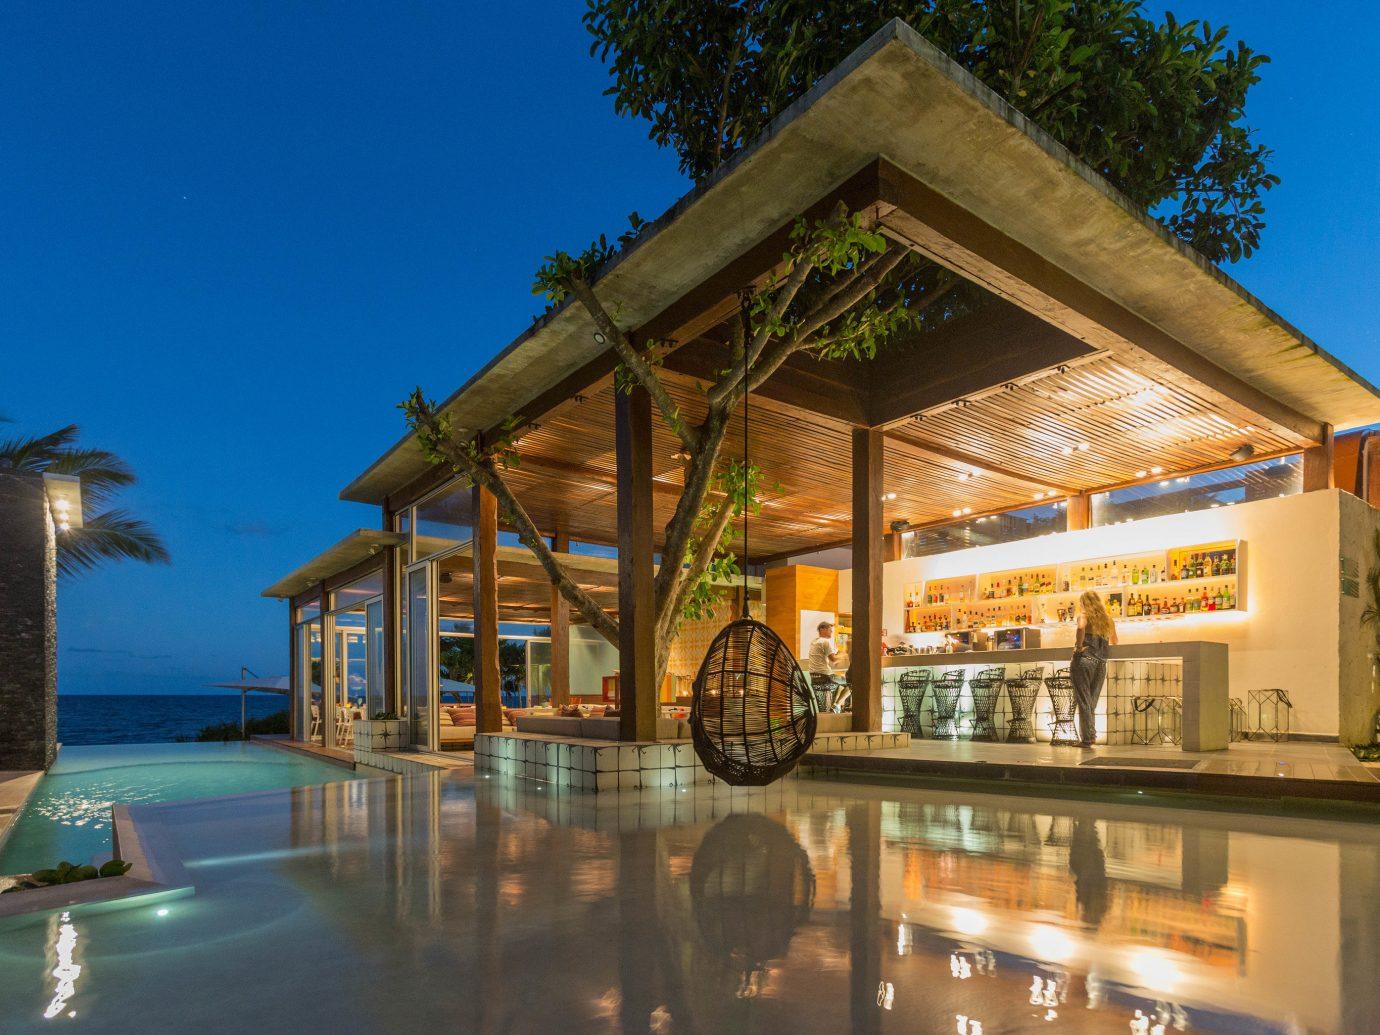 Trip Ideas leisure property building Resort estate vacation home real estate restaurant several